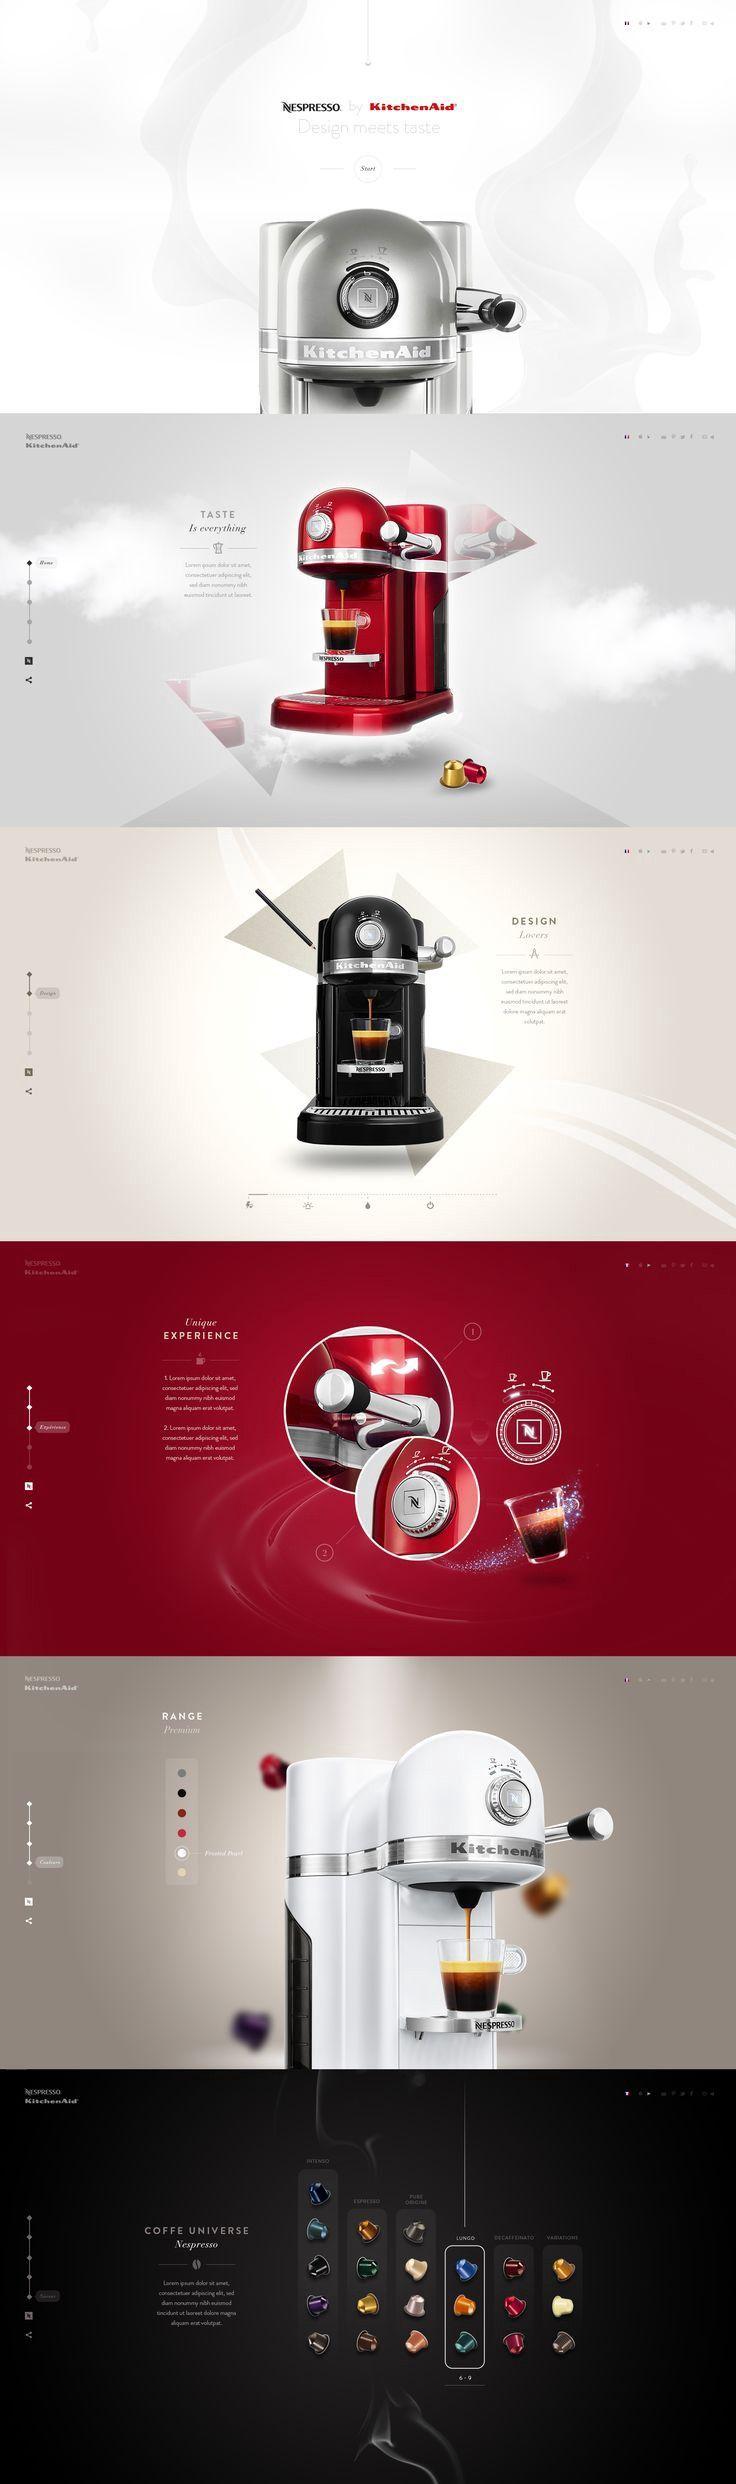 30 University And College Websites Inspiration Designyep University Website Corporate Website Design Beautiful Website Design